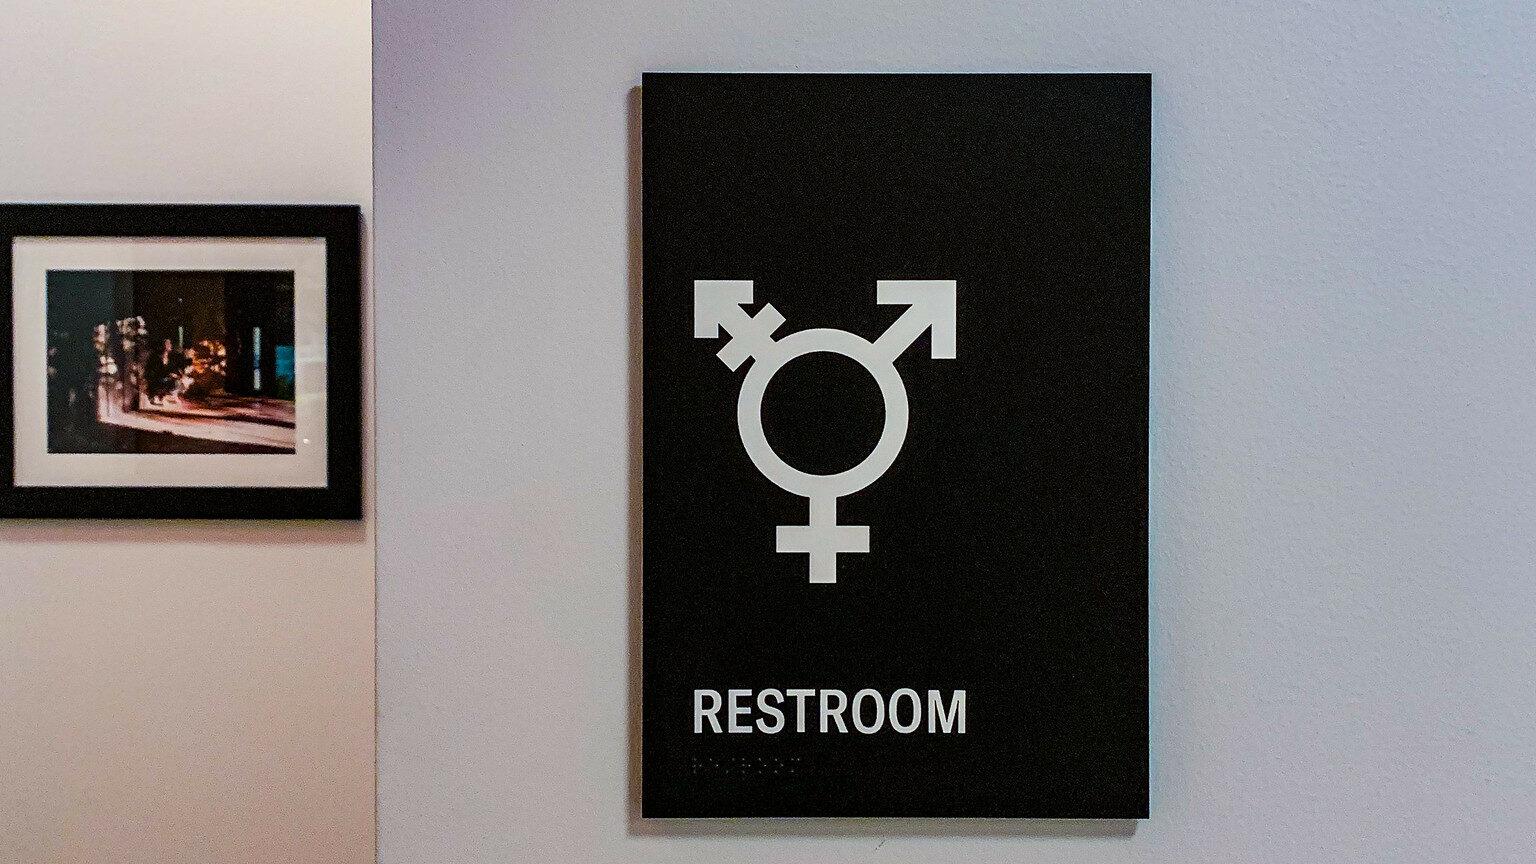 Transgender toilets